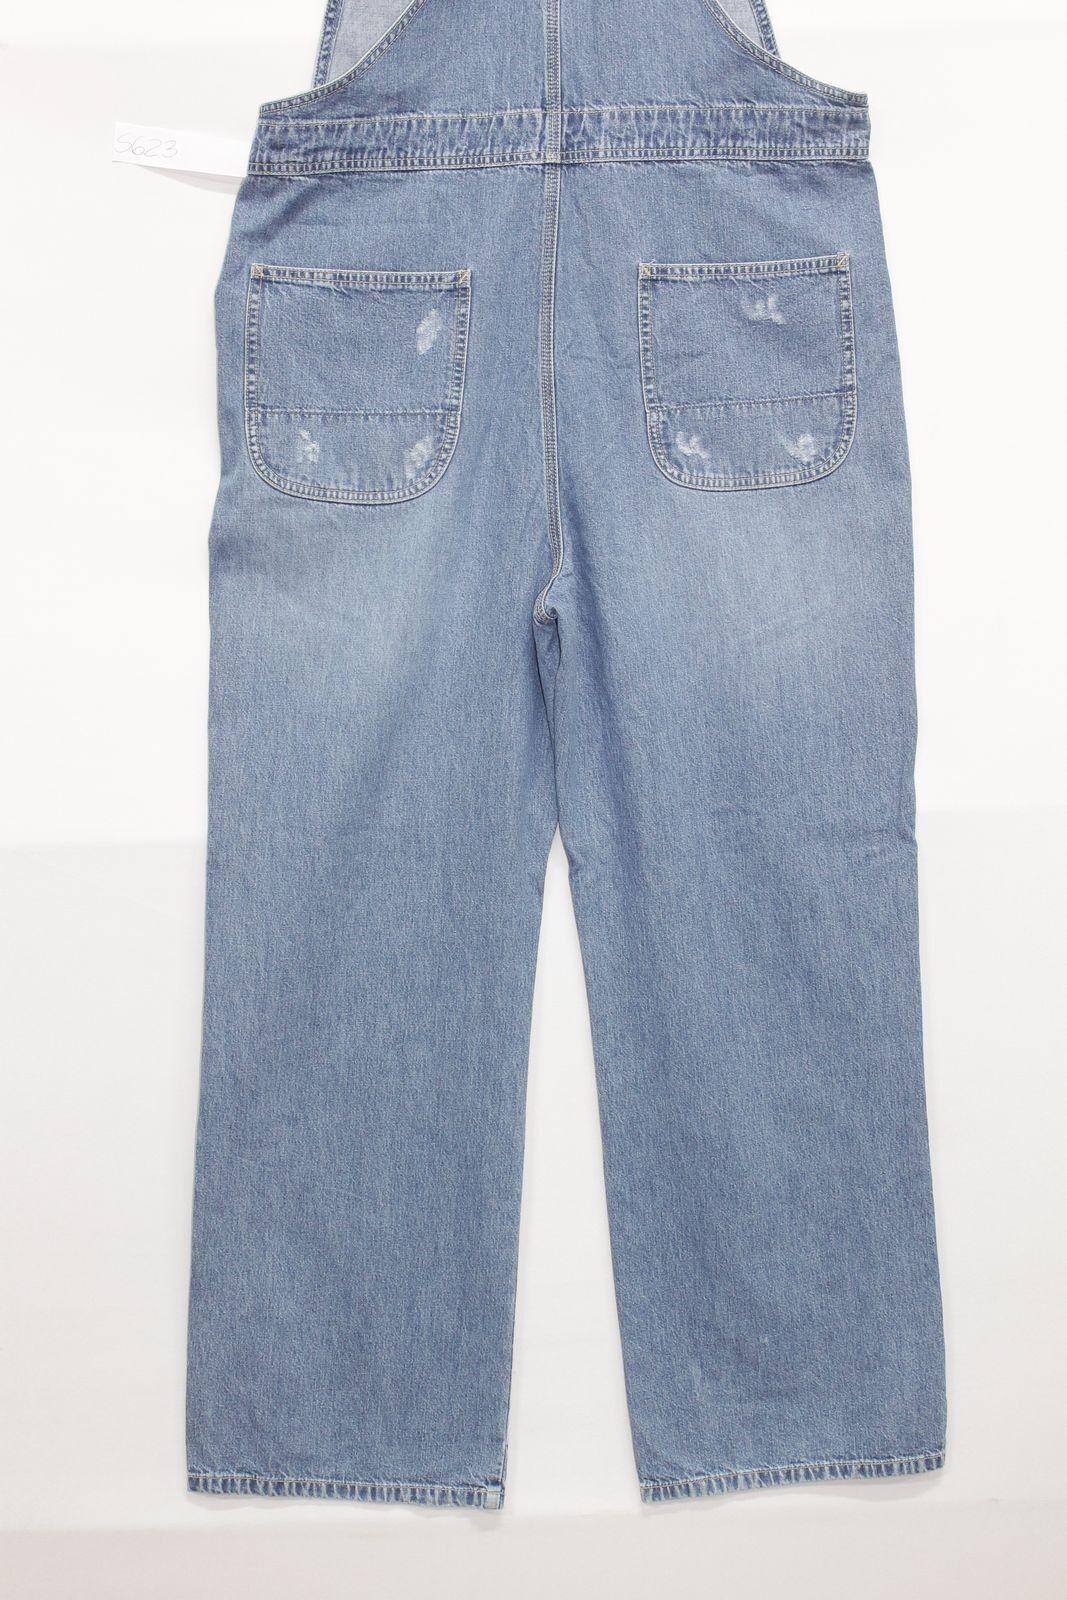 Salopette GAP GAP GAP (Cod. S623) tg.L Jeans usato vintage Custom rotture Boyfriend 54485b